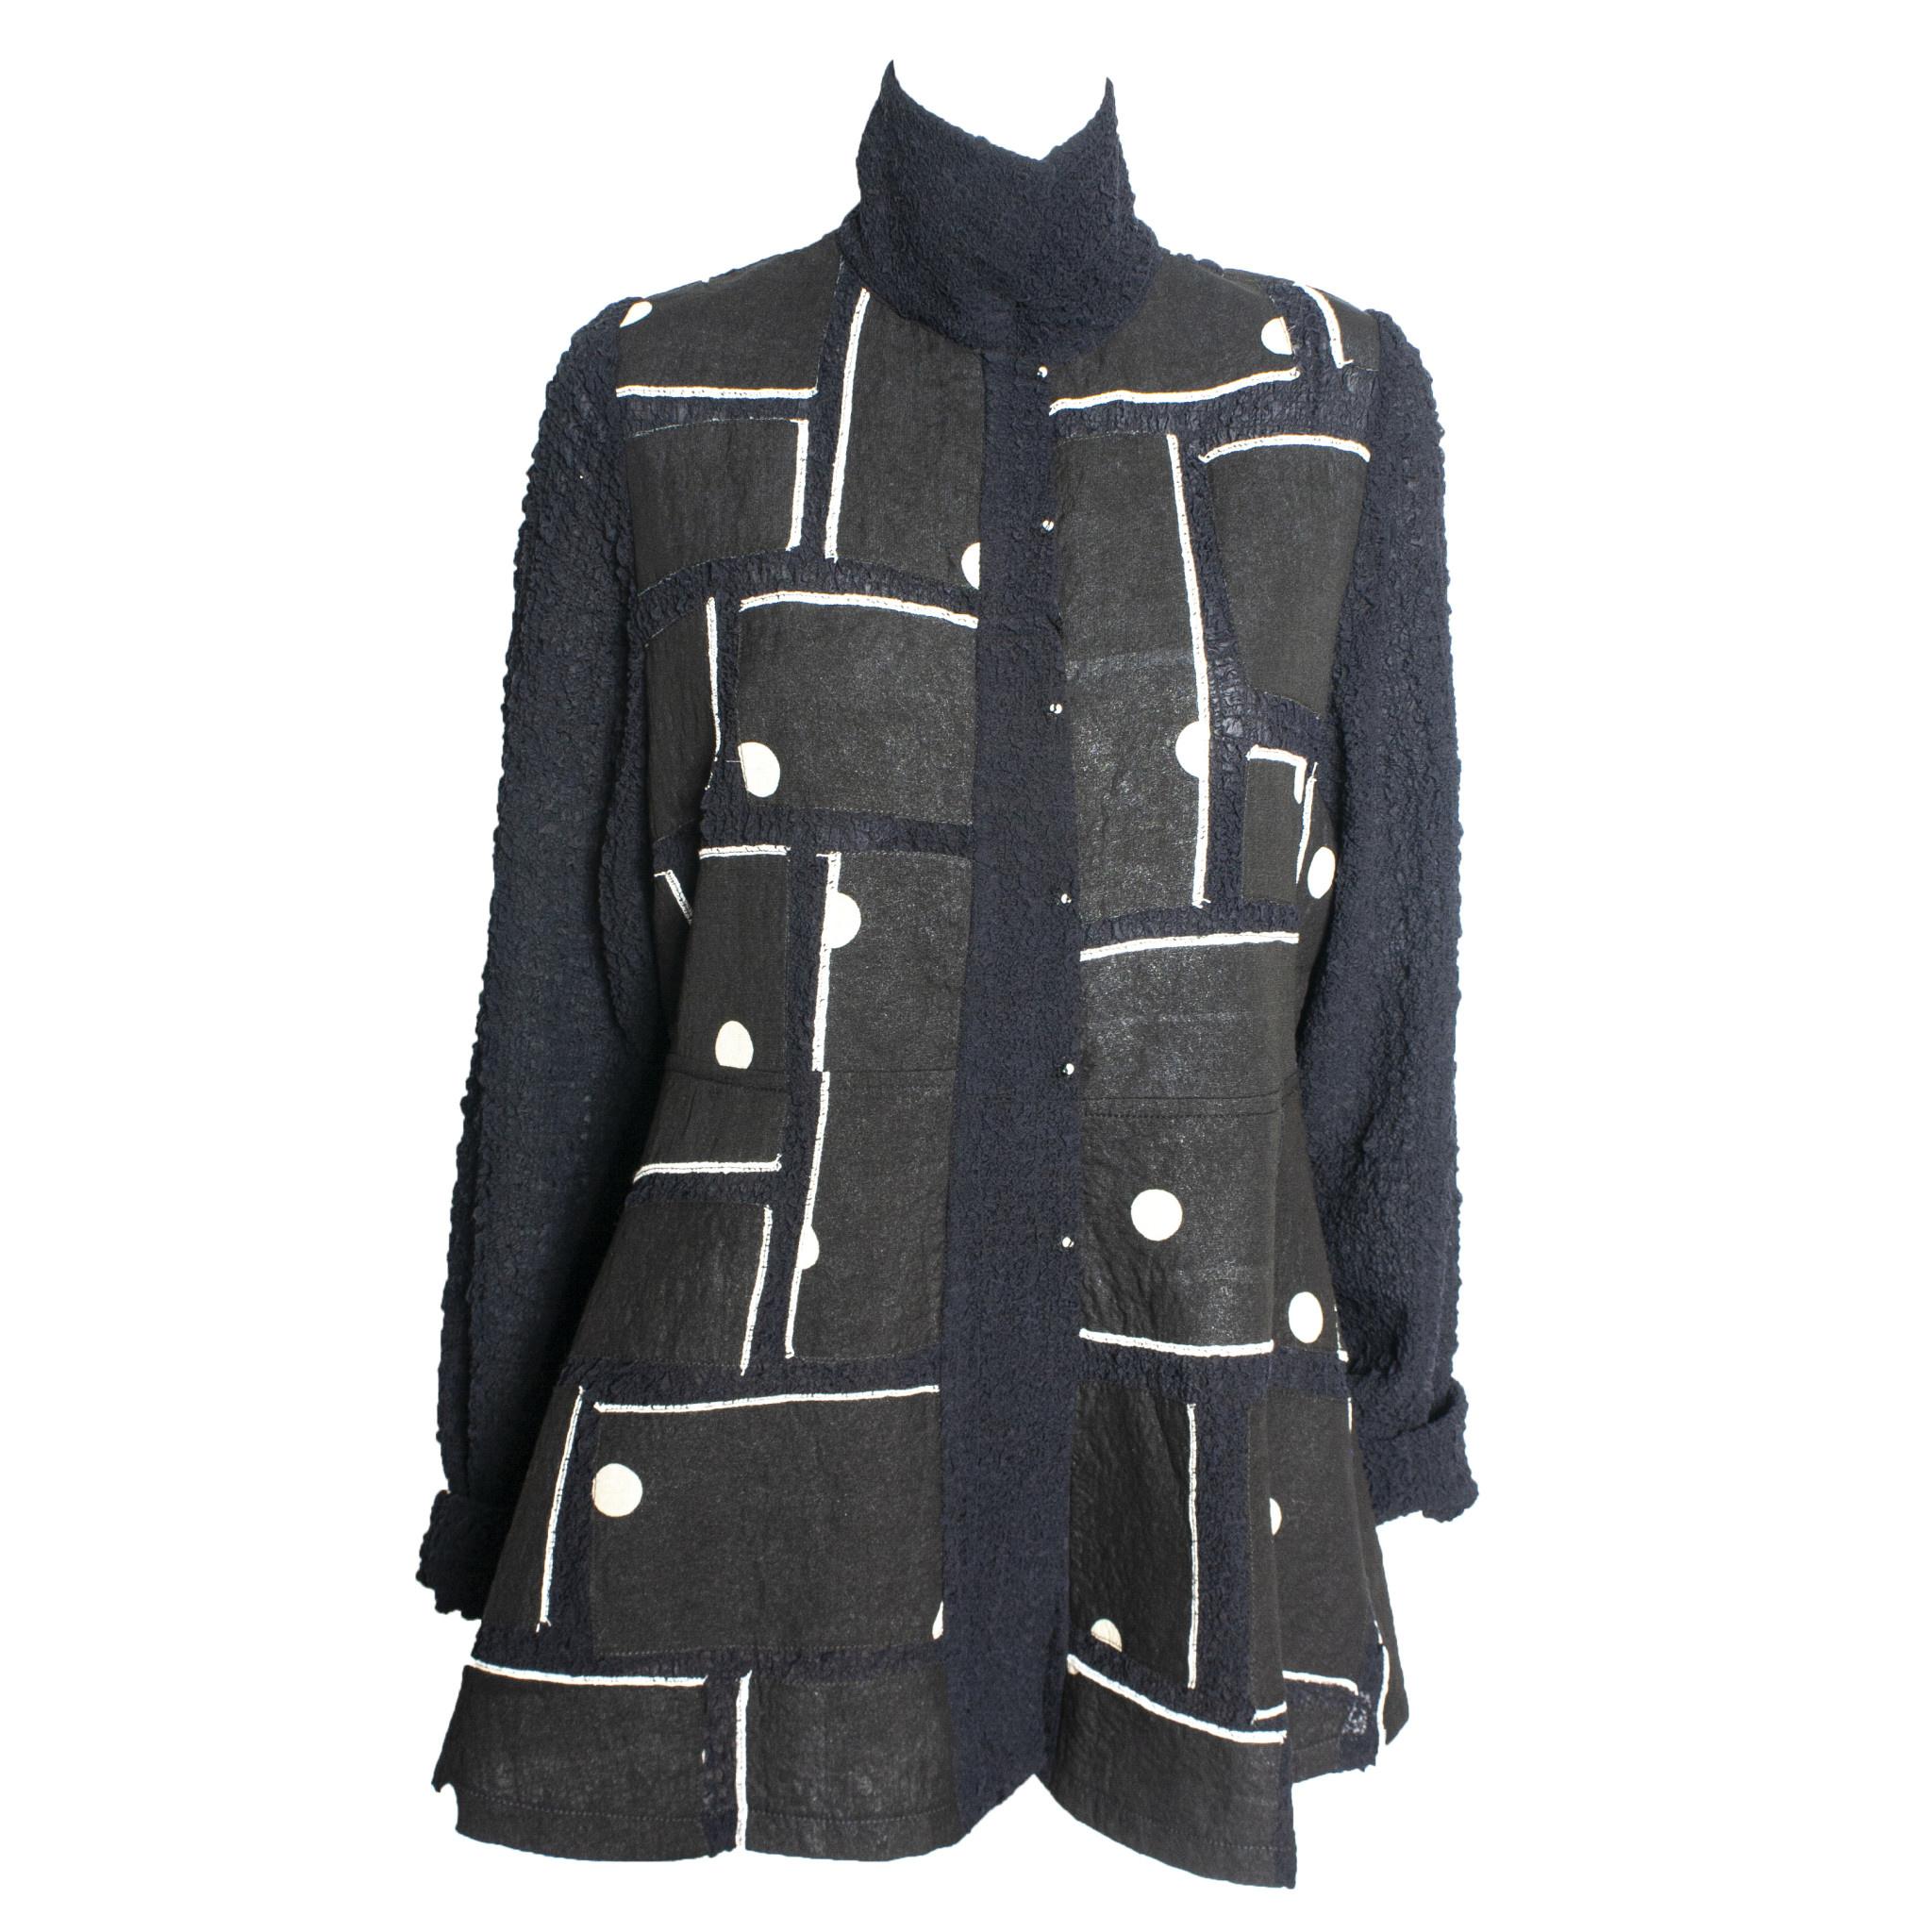 Deborah Cross Deborah Cross Block Scrunch Shirt - Navy/Black